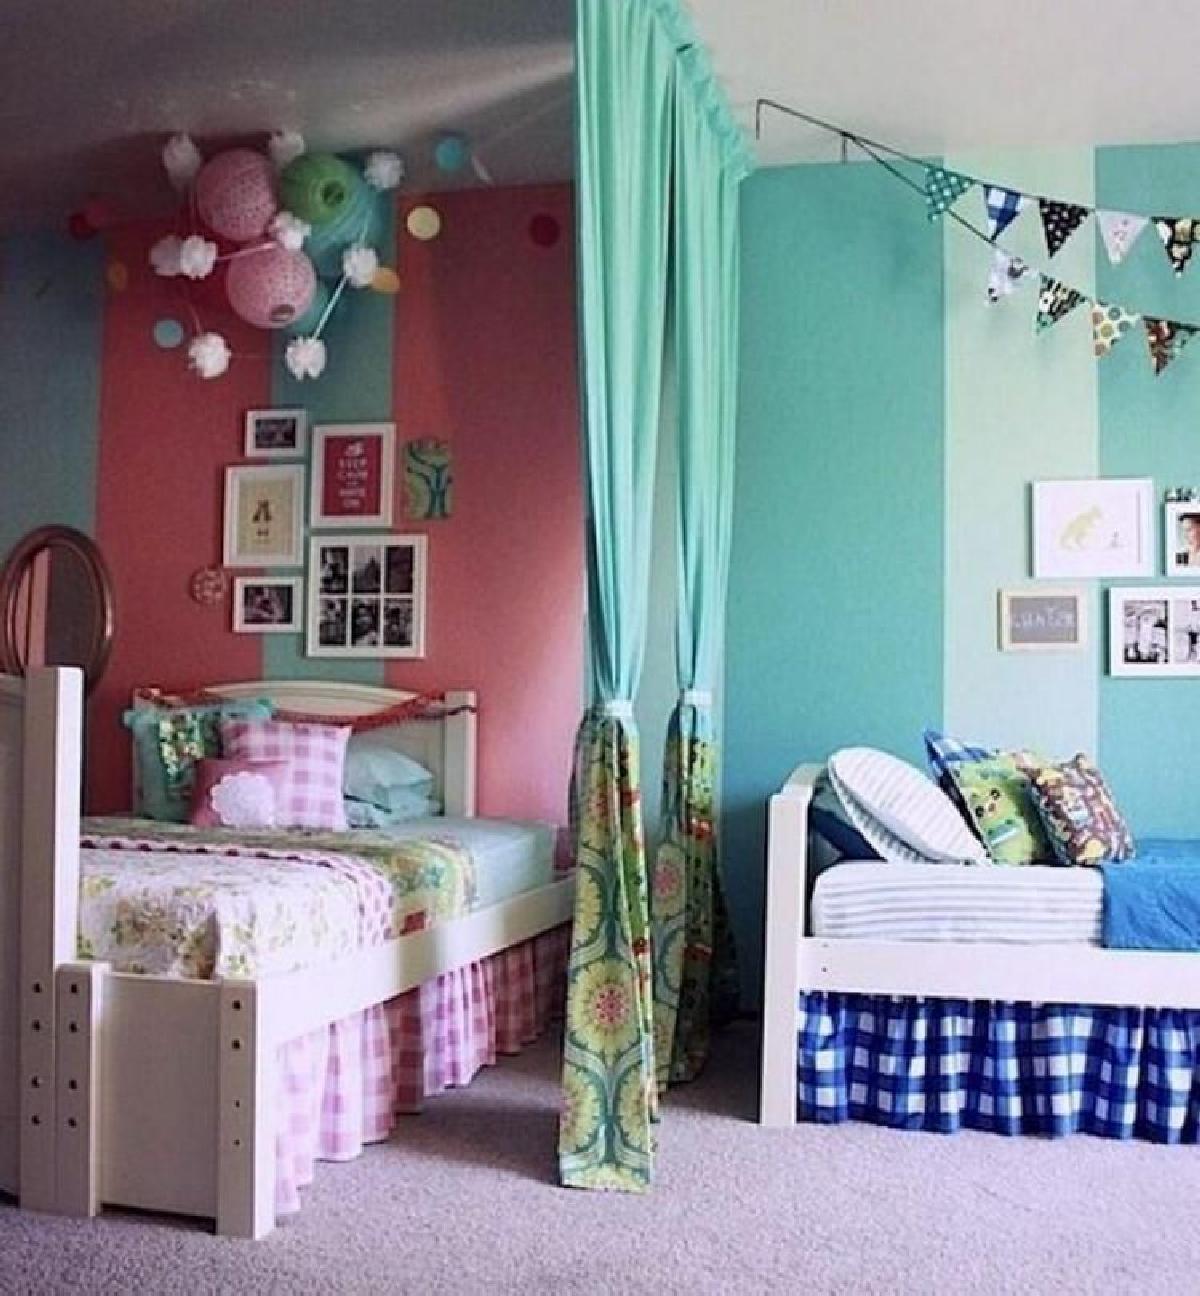 1615455348 507 Paylasilan cocuk yatak odalari nasil dekore edilir